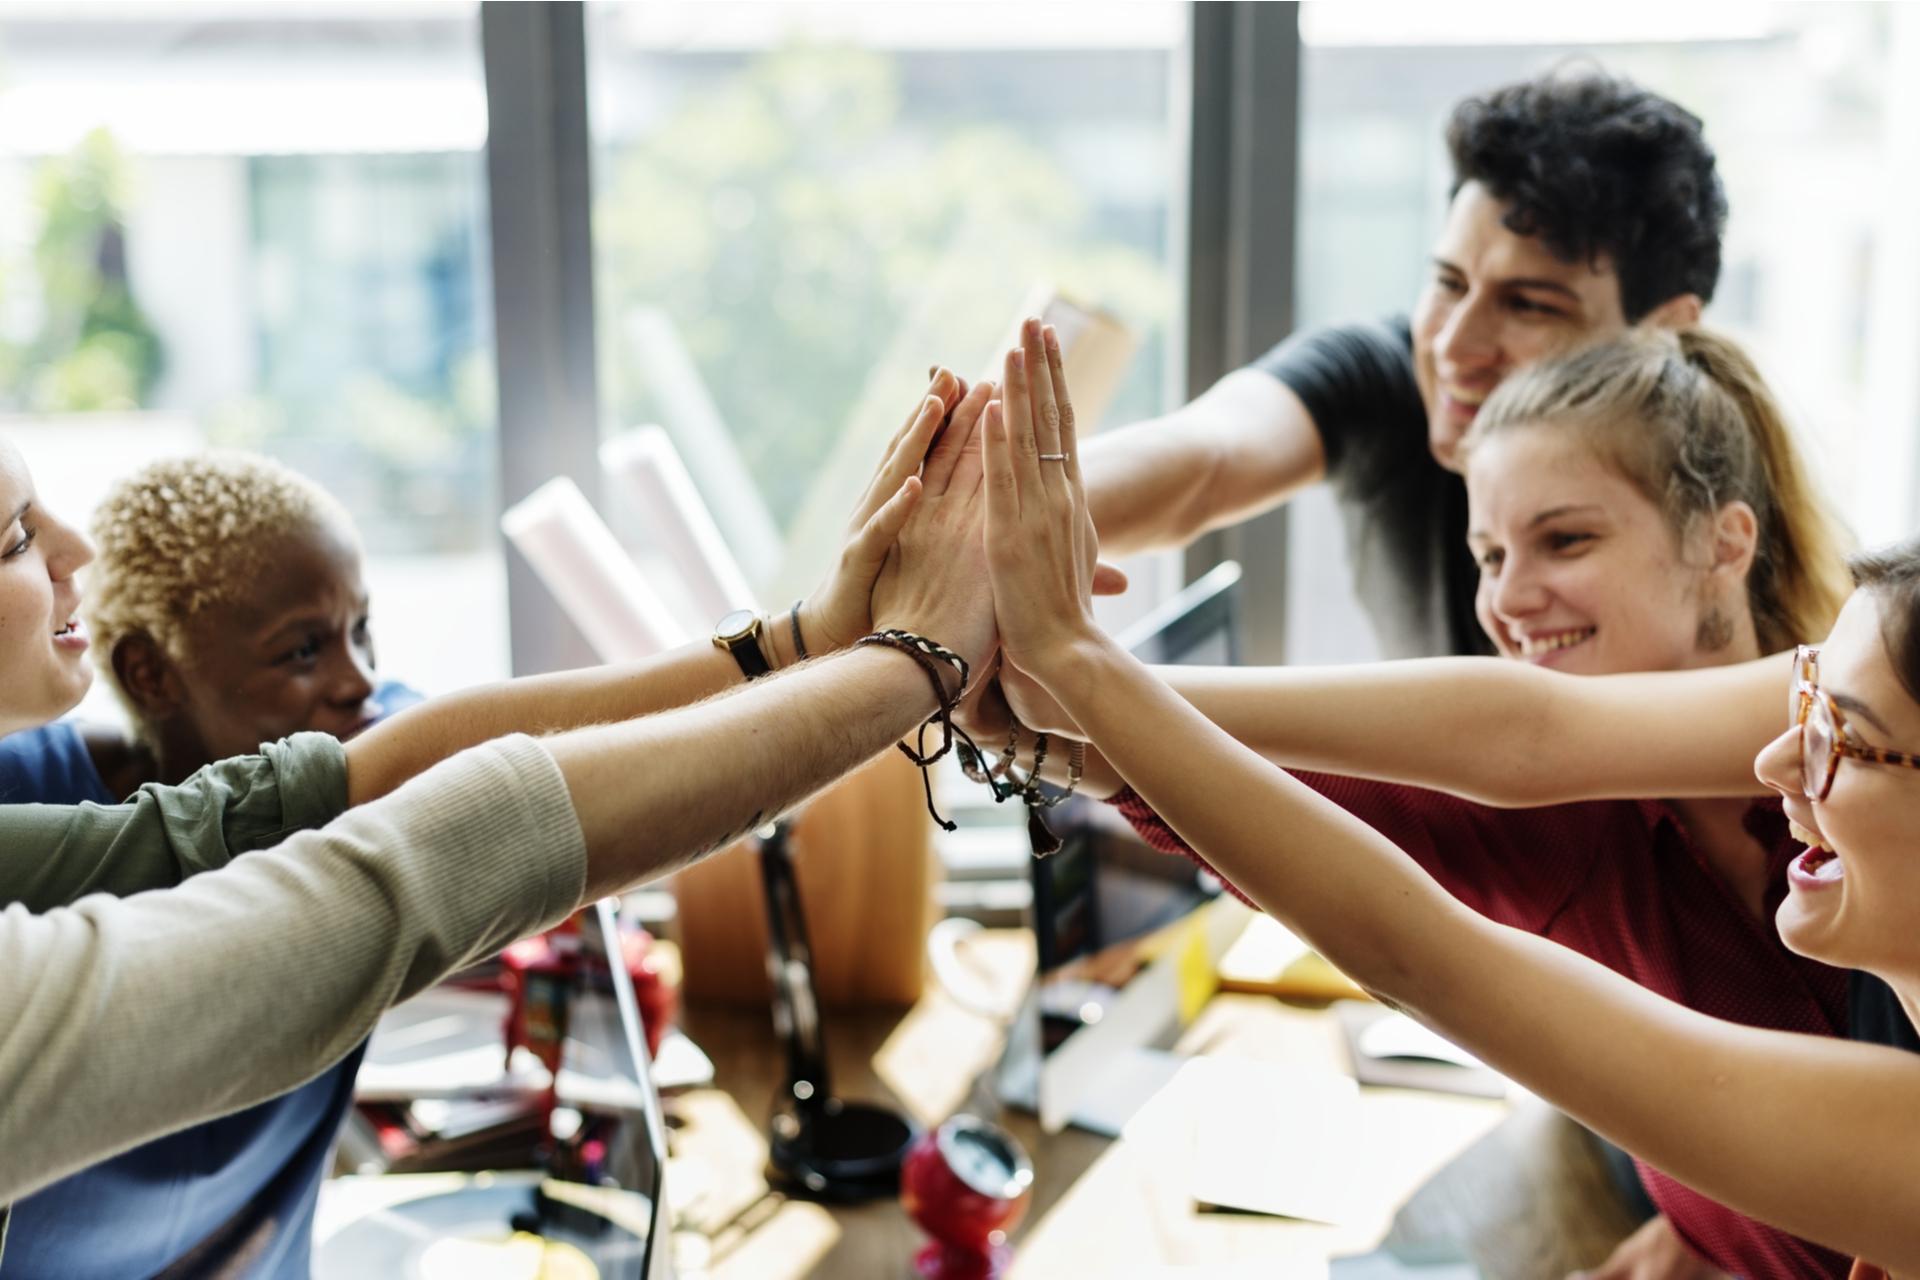 Teamwork successful high five together